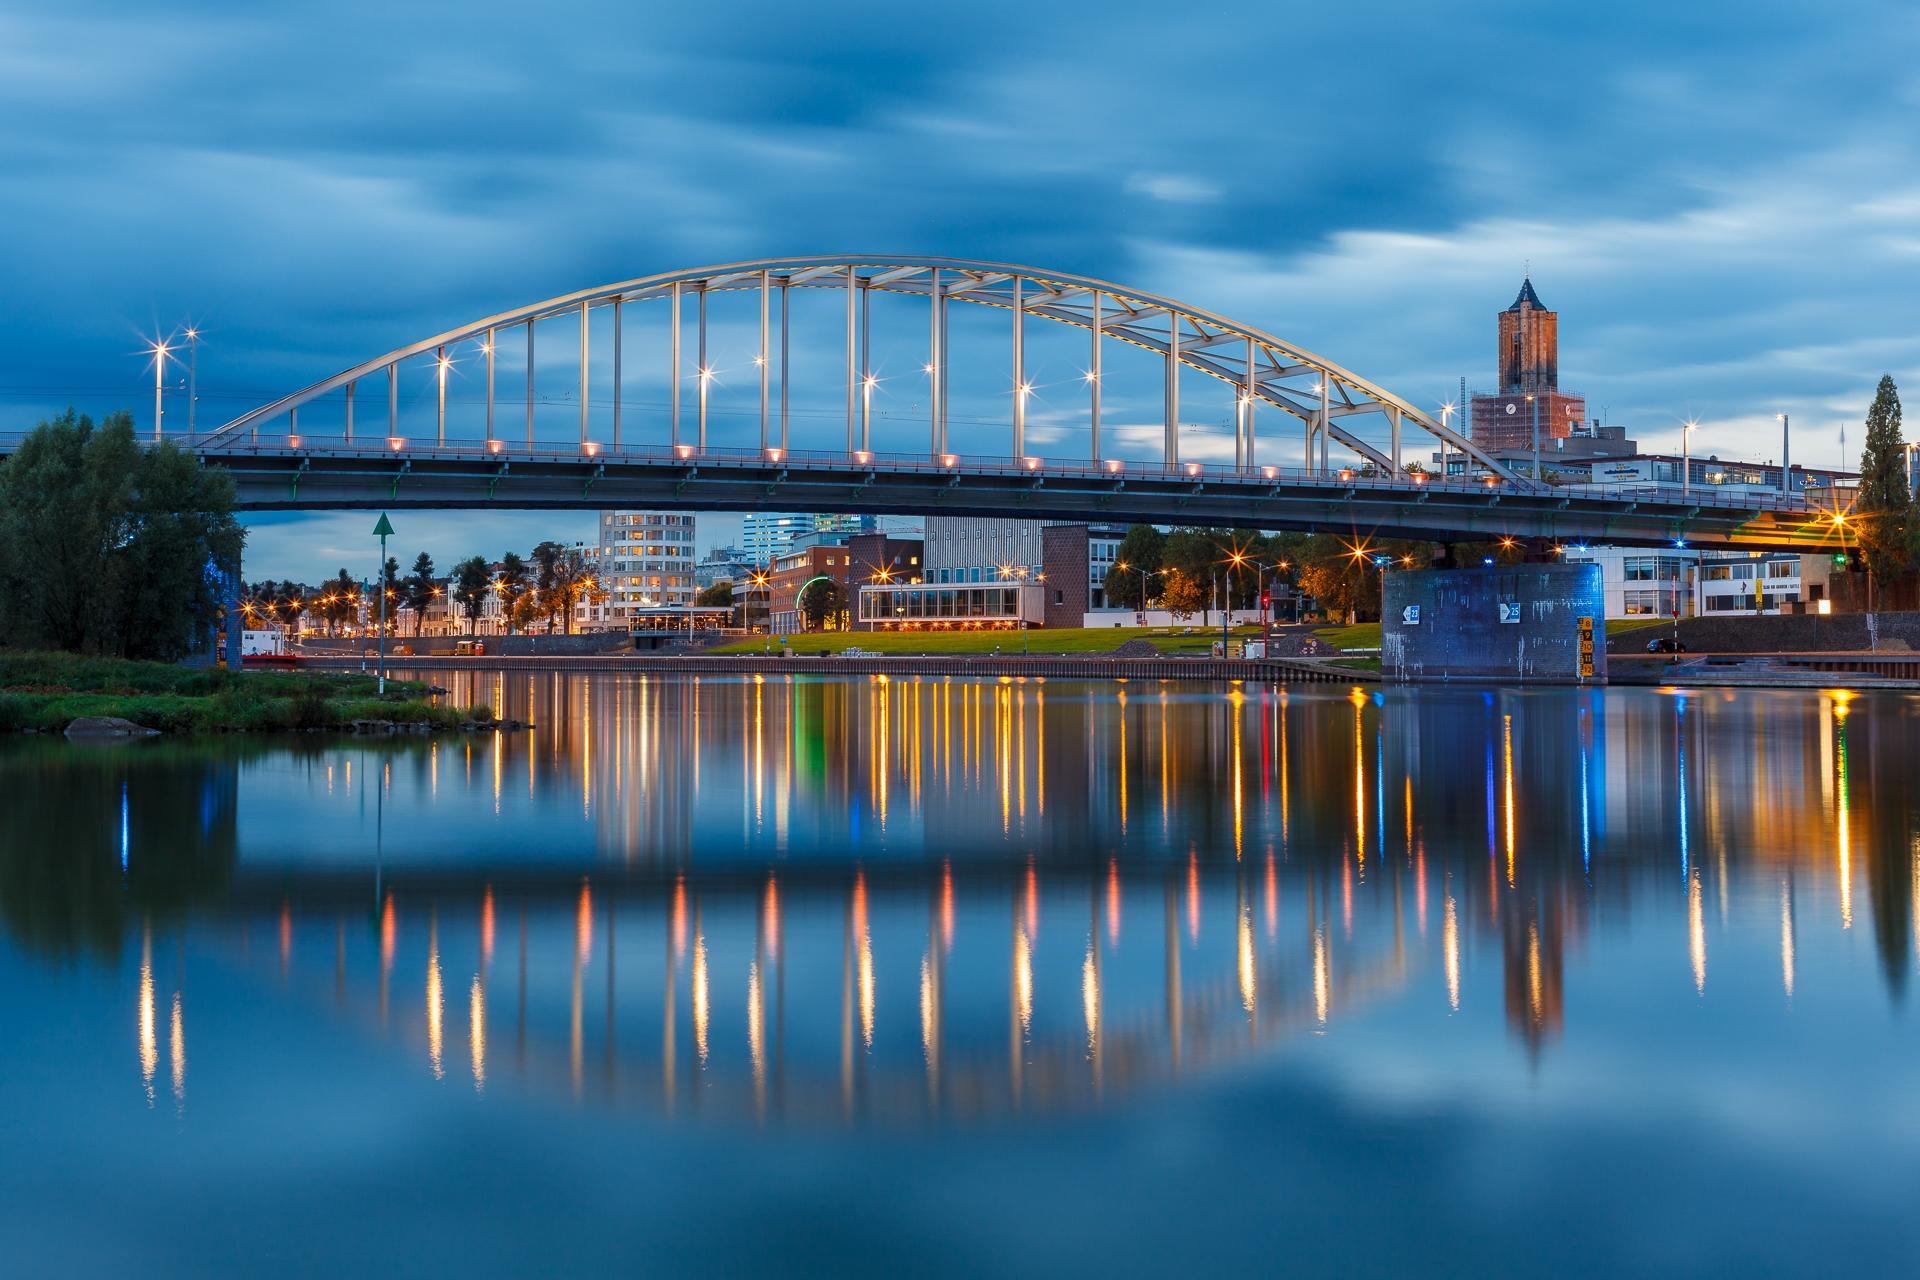 Arnhem oude brug